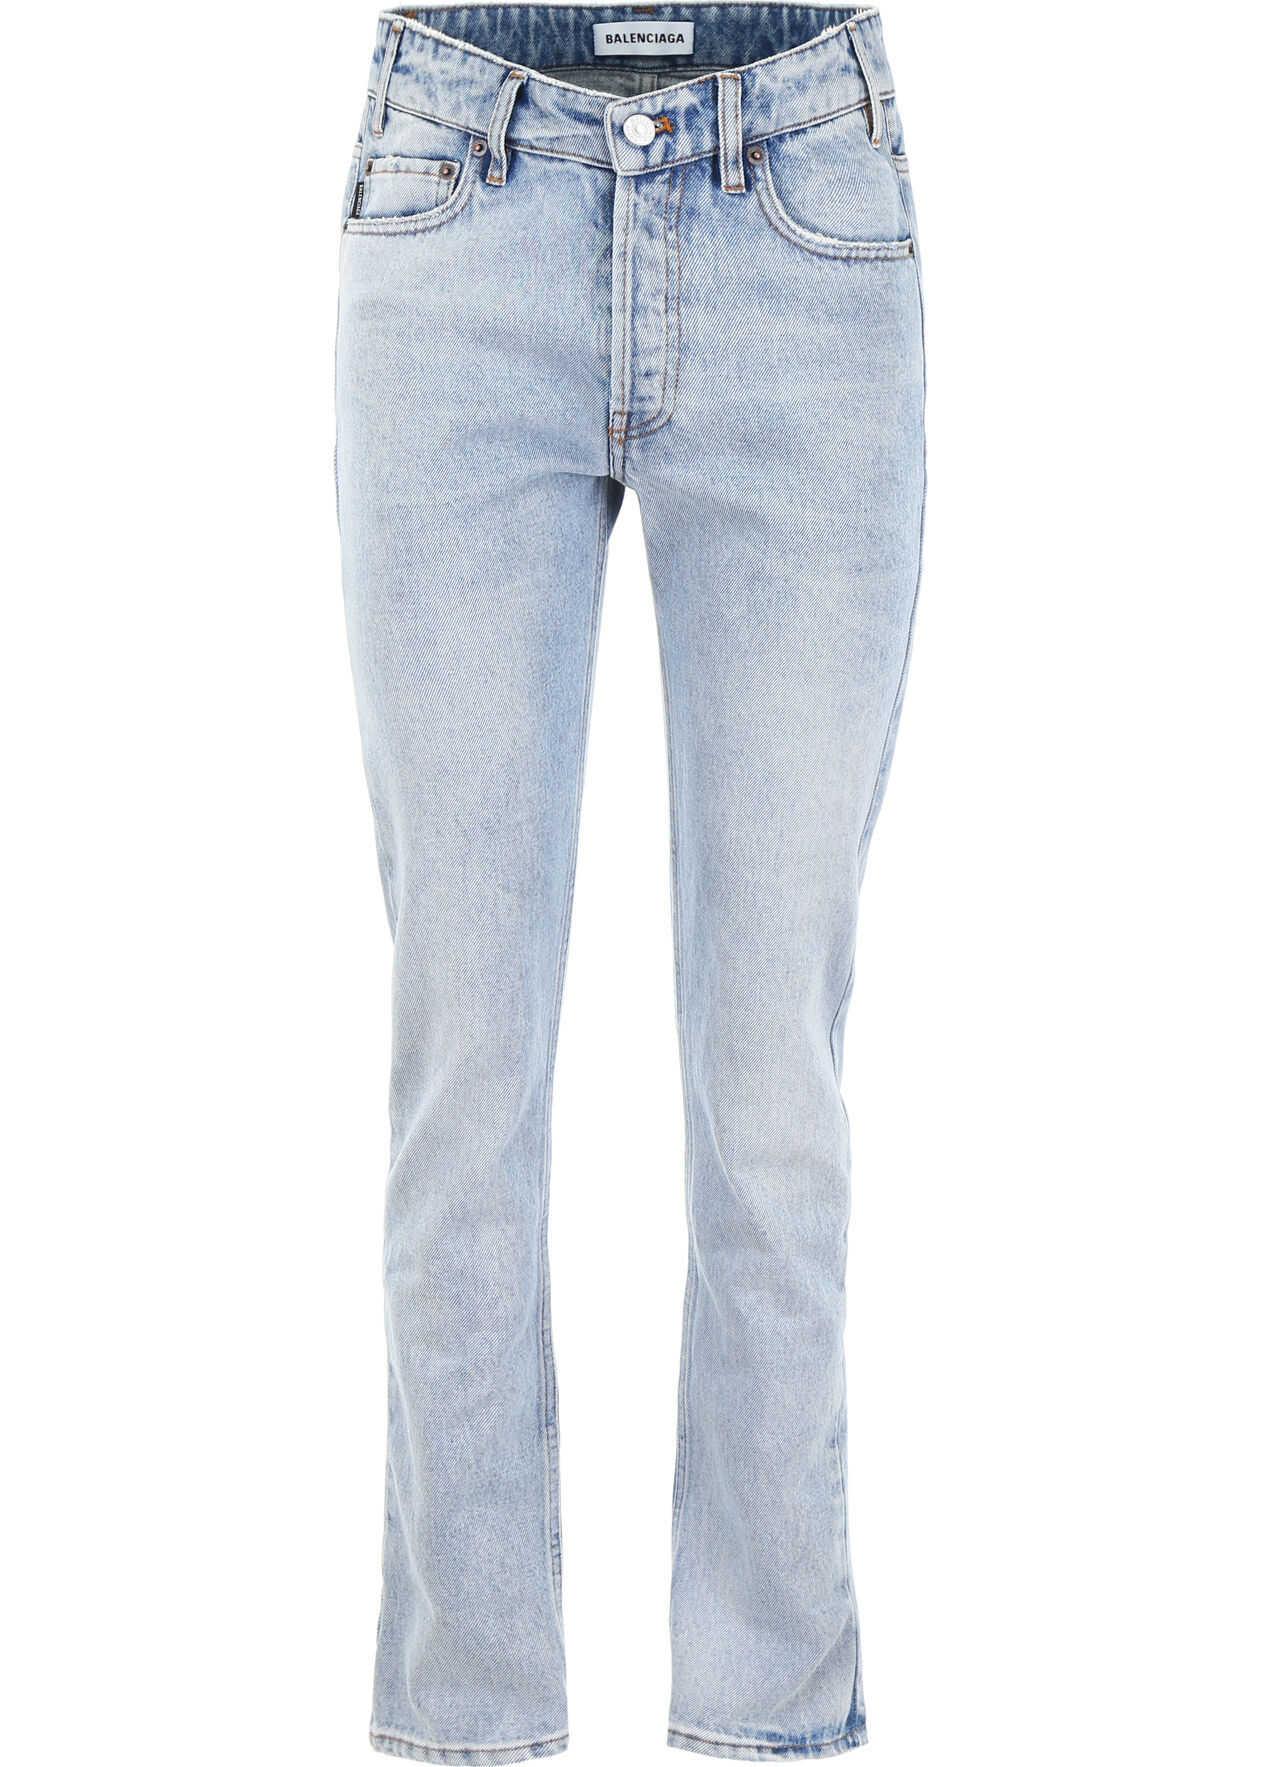 Balenciaga V Waist Jeans DIRTY LIGHT BLUE